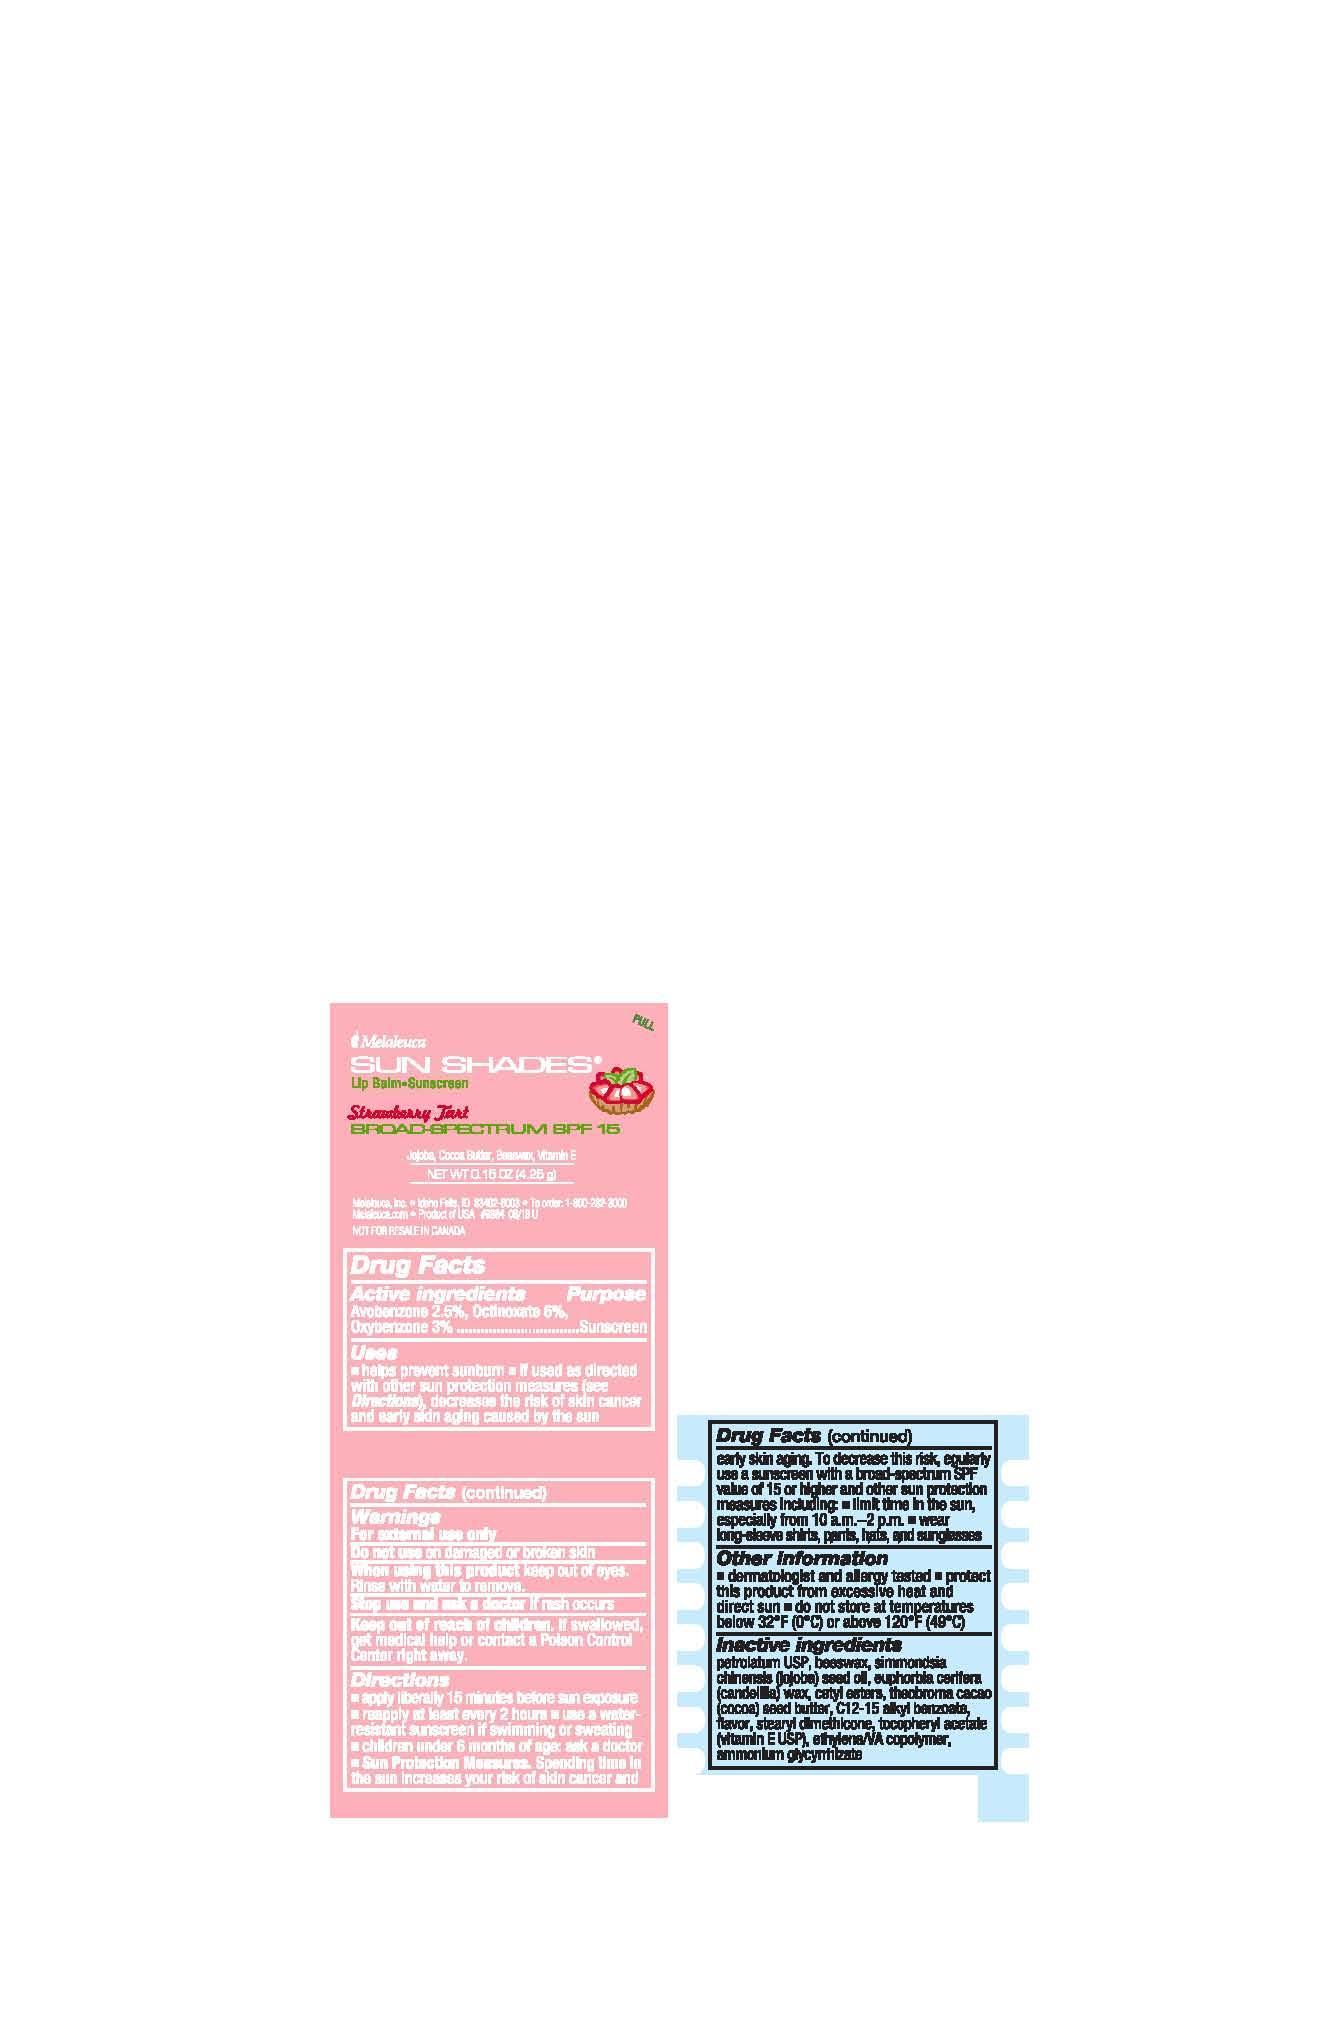 Sun Shades Lip Balm Strawberry Tart (Avobenzone 2.5%, Octinoxate 6%, Oxybenzone 3%) Stick [Melaleuca Inc.]